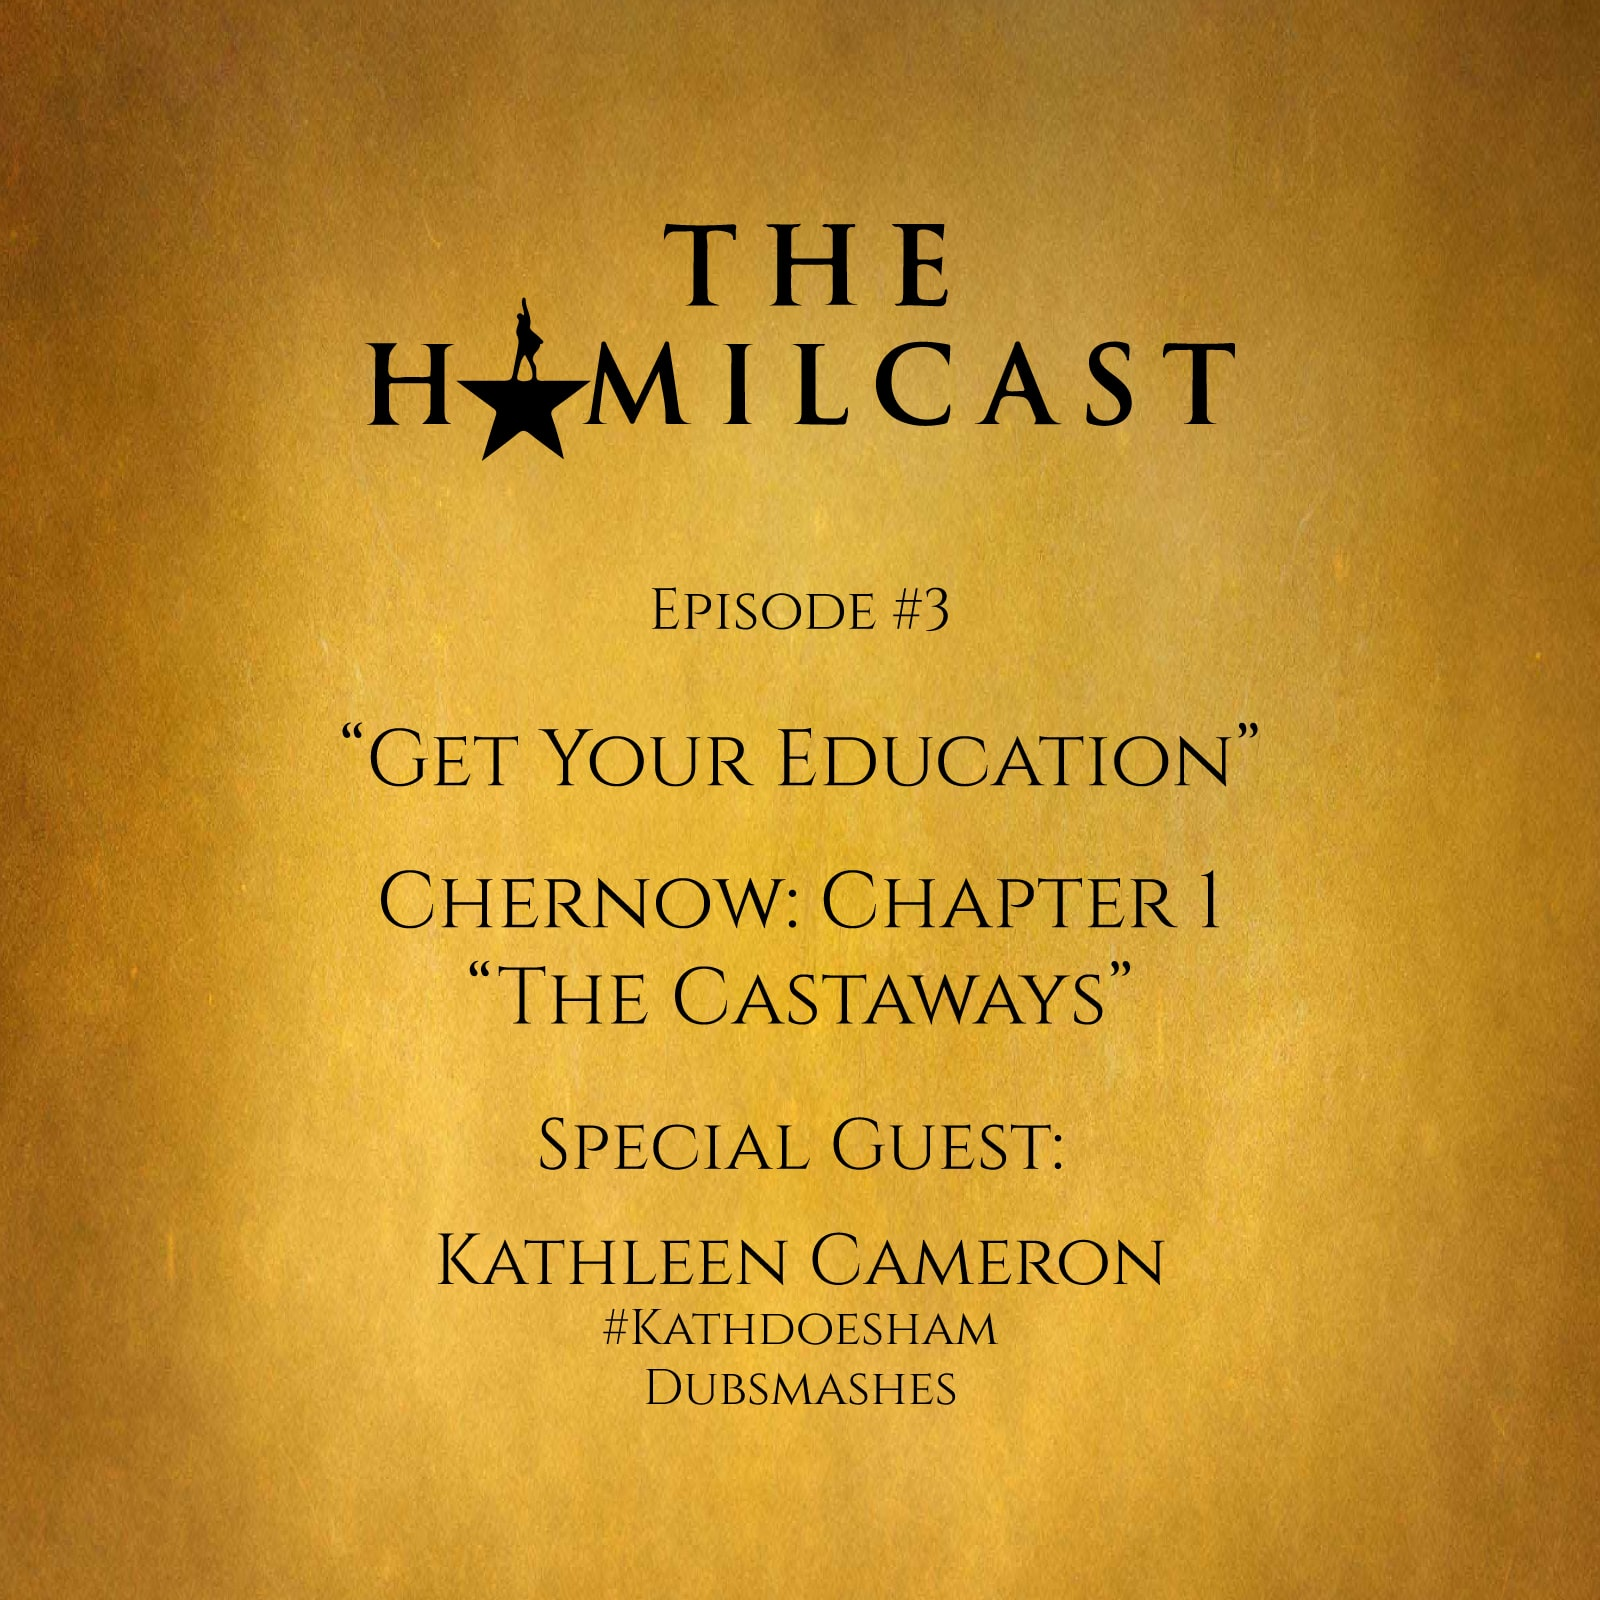 #3: Kathleen Cameron (#KathDoesHam) // Chernow Chapter 1: The Castaways